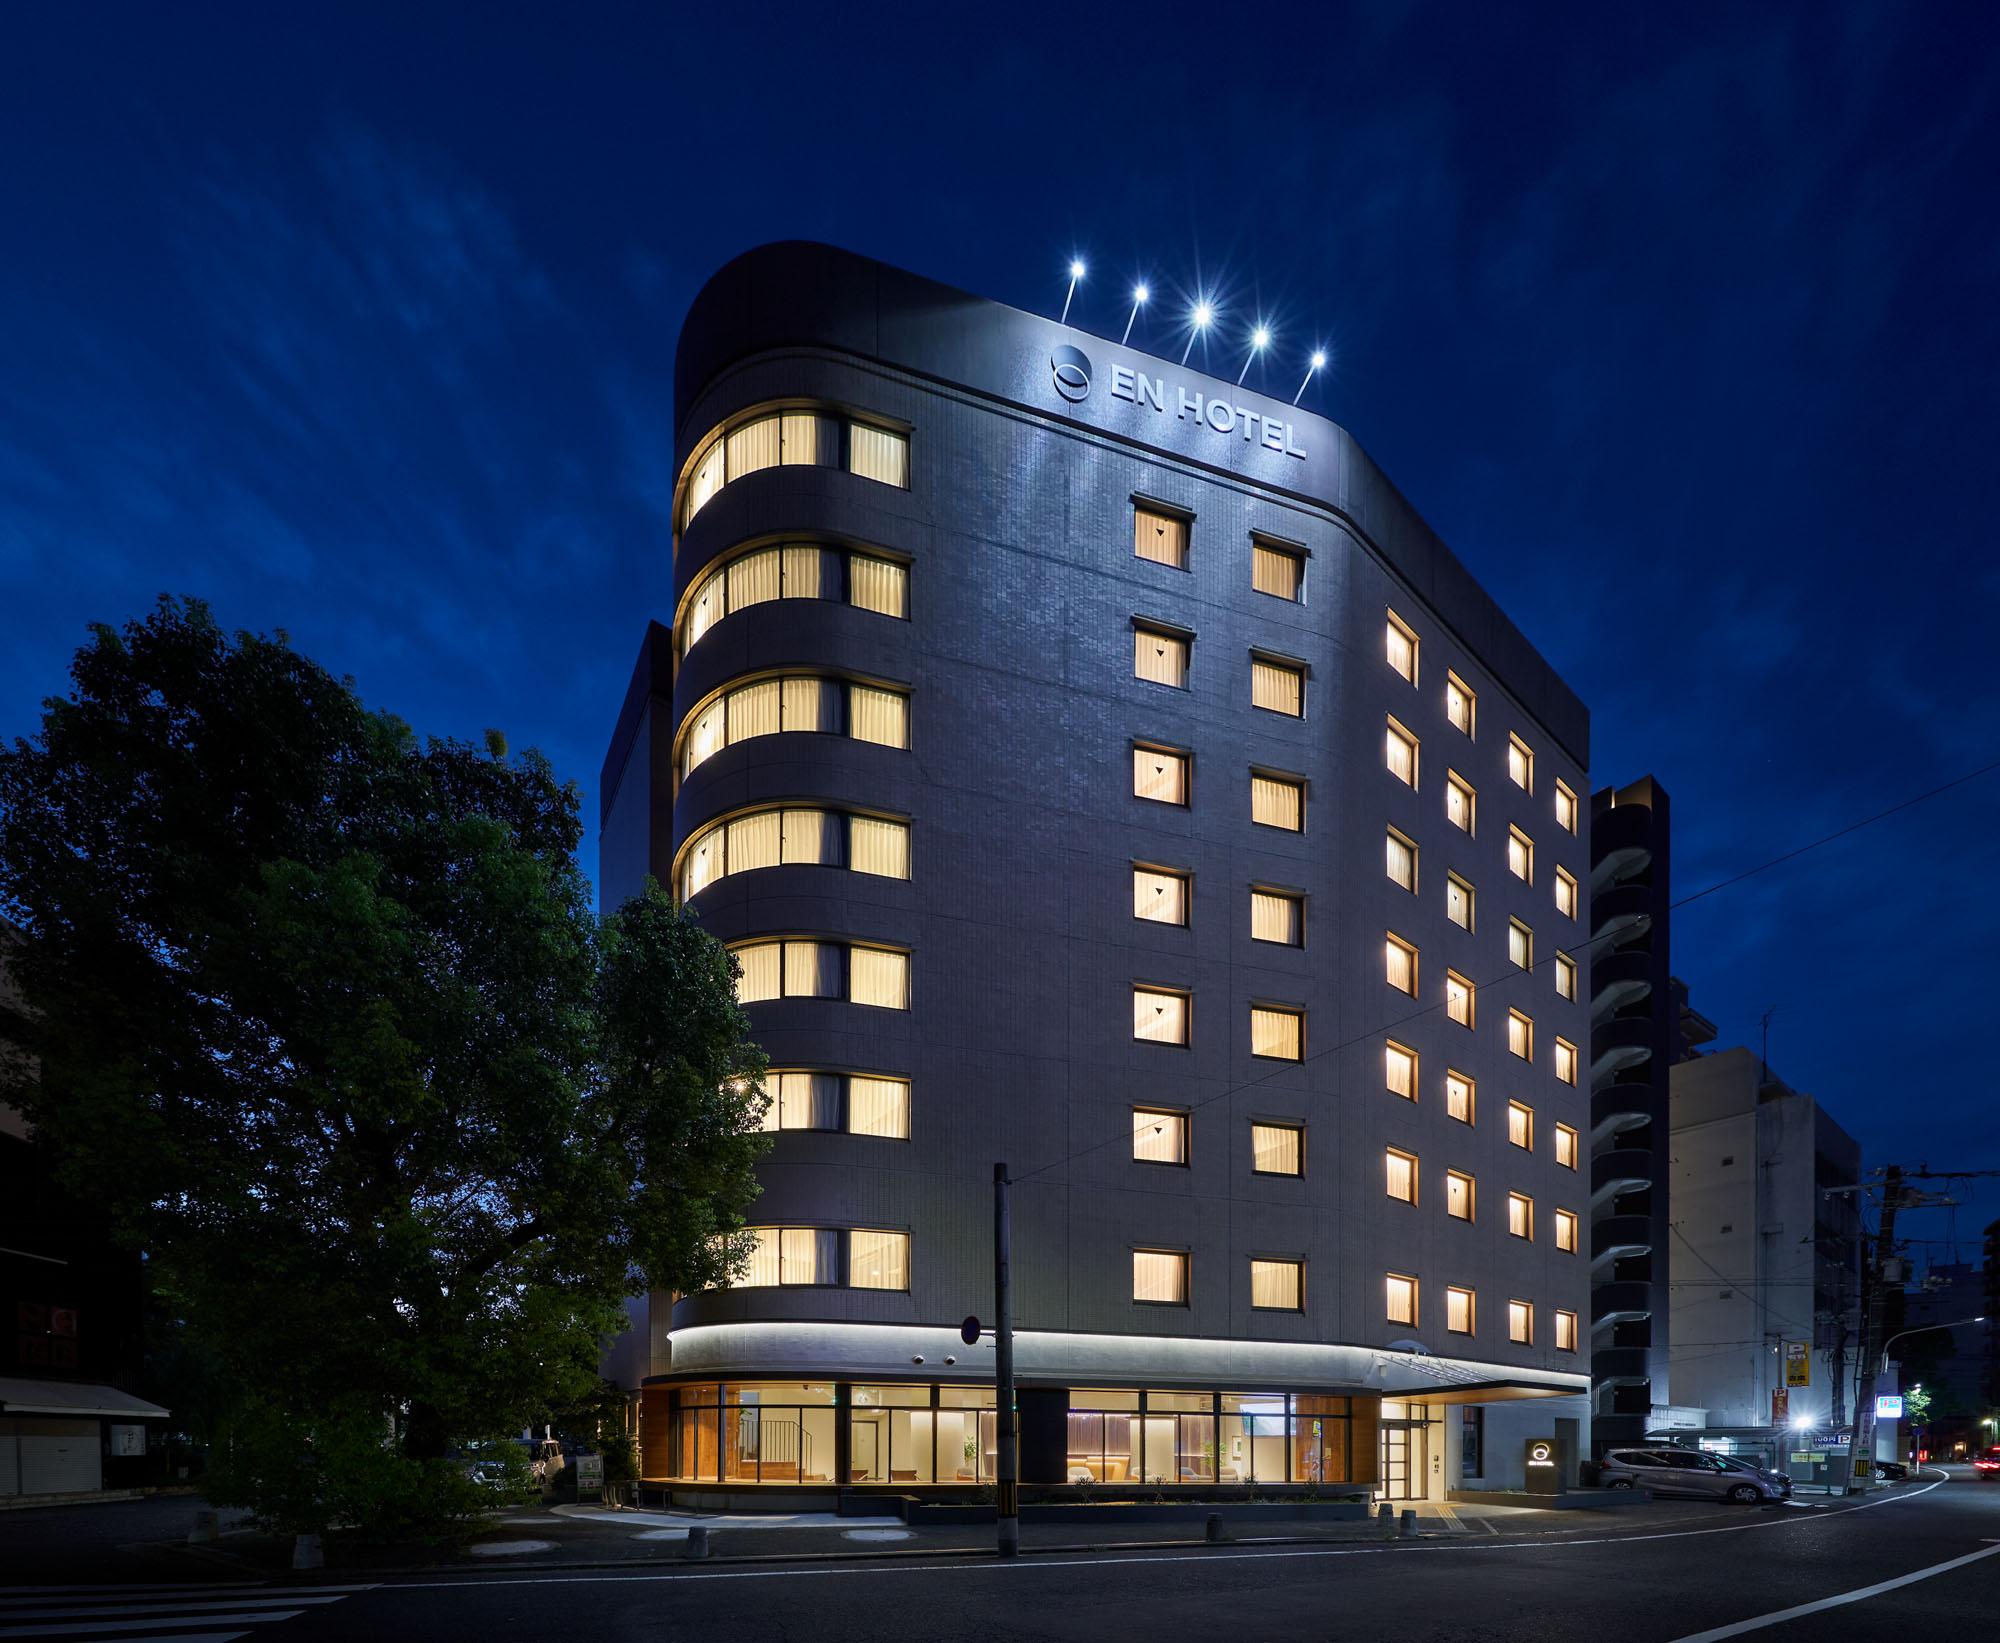 EN HOTEL Hiroshima(旧:コートホテル広島)